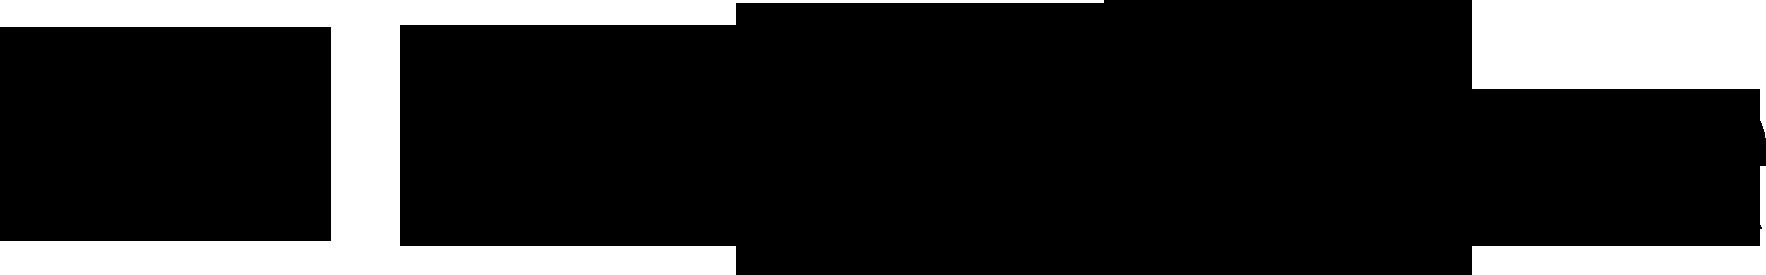 Readyforce logo